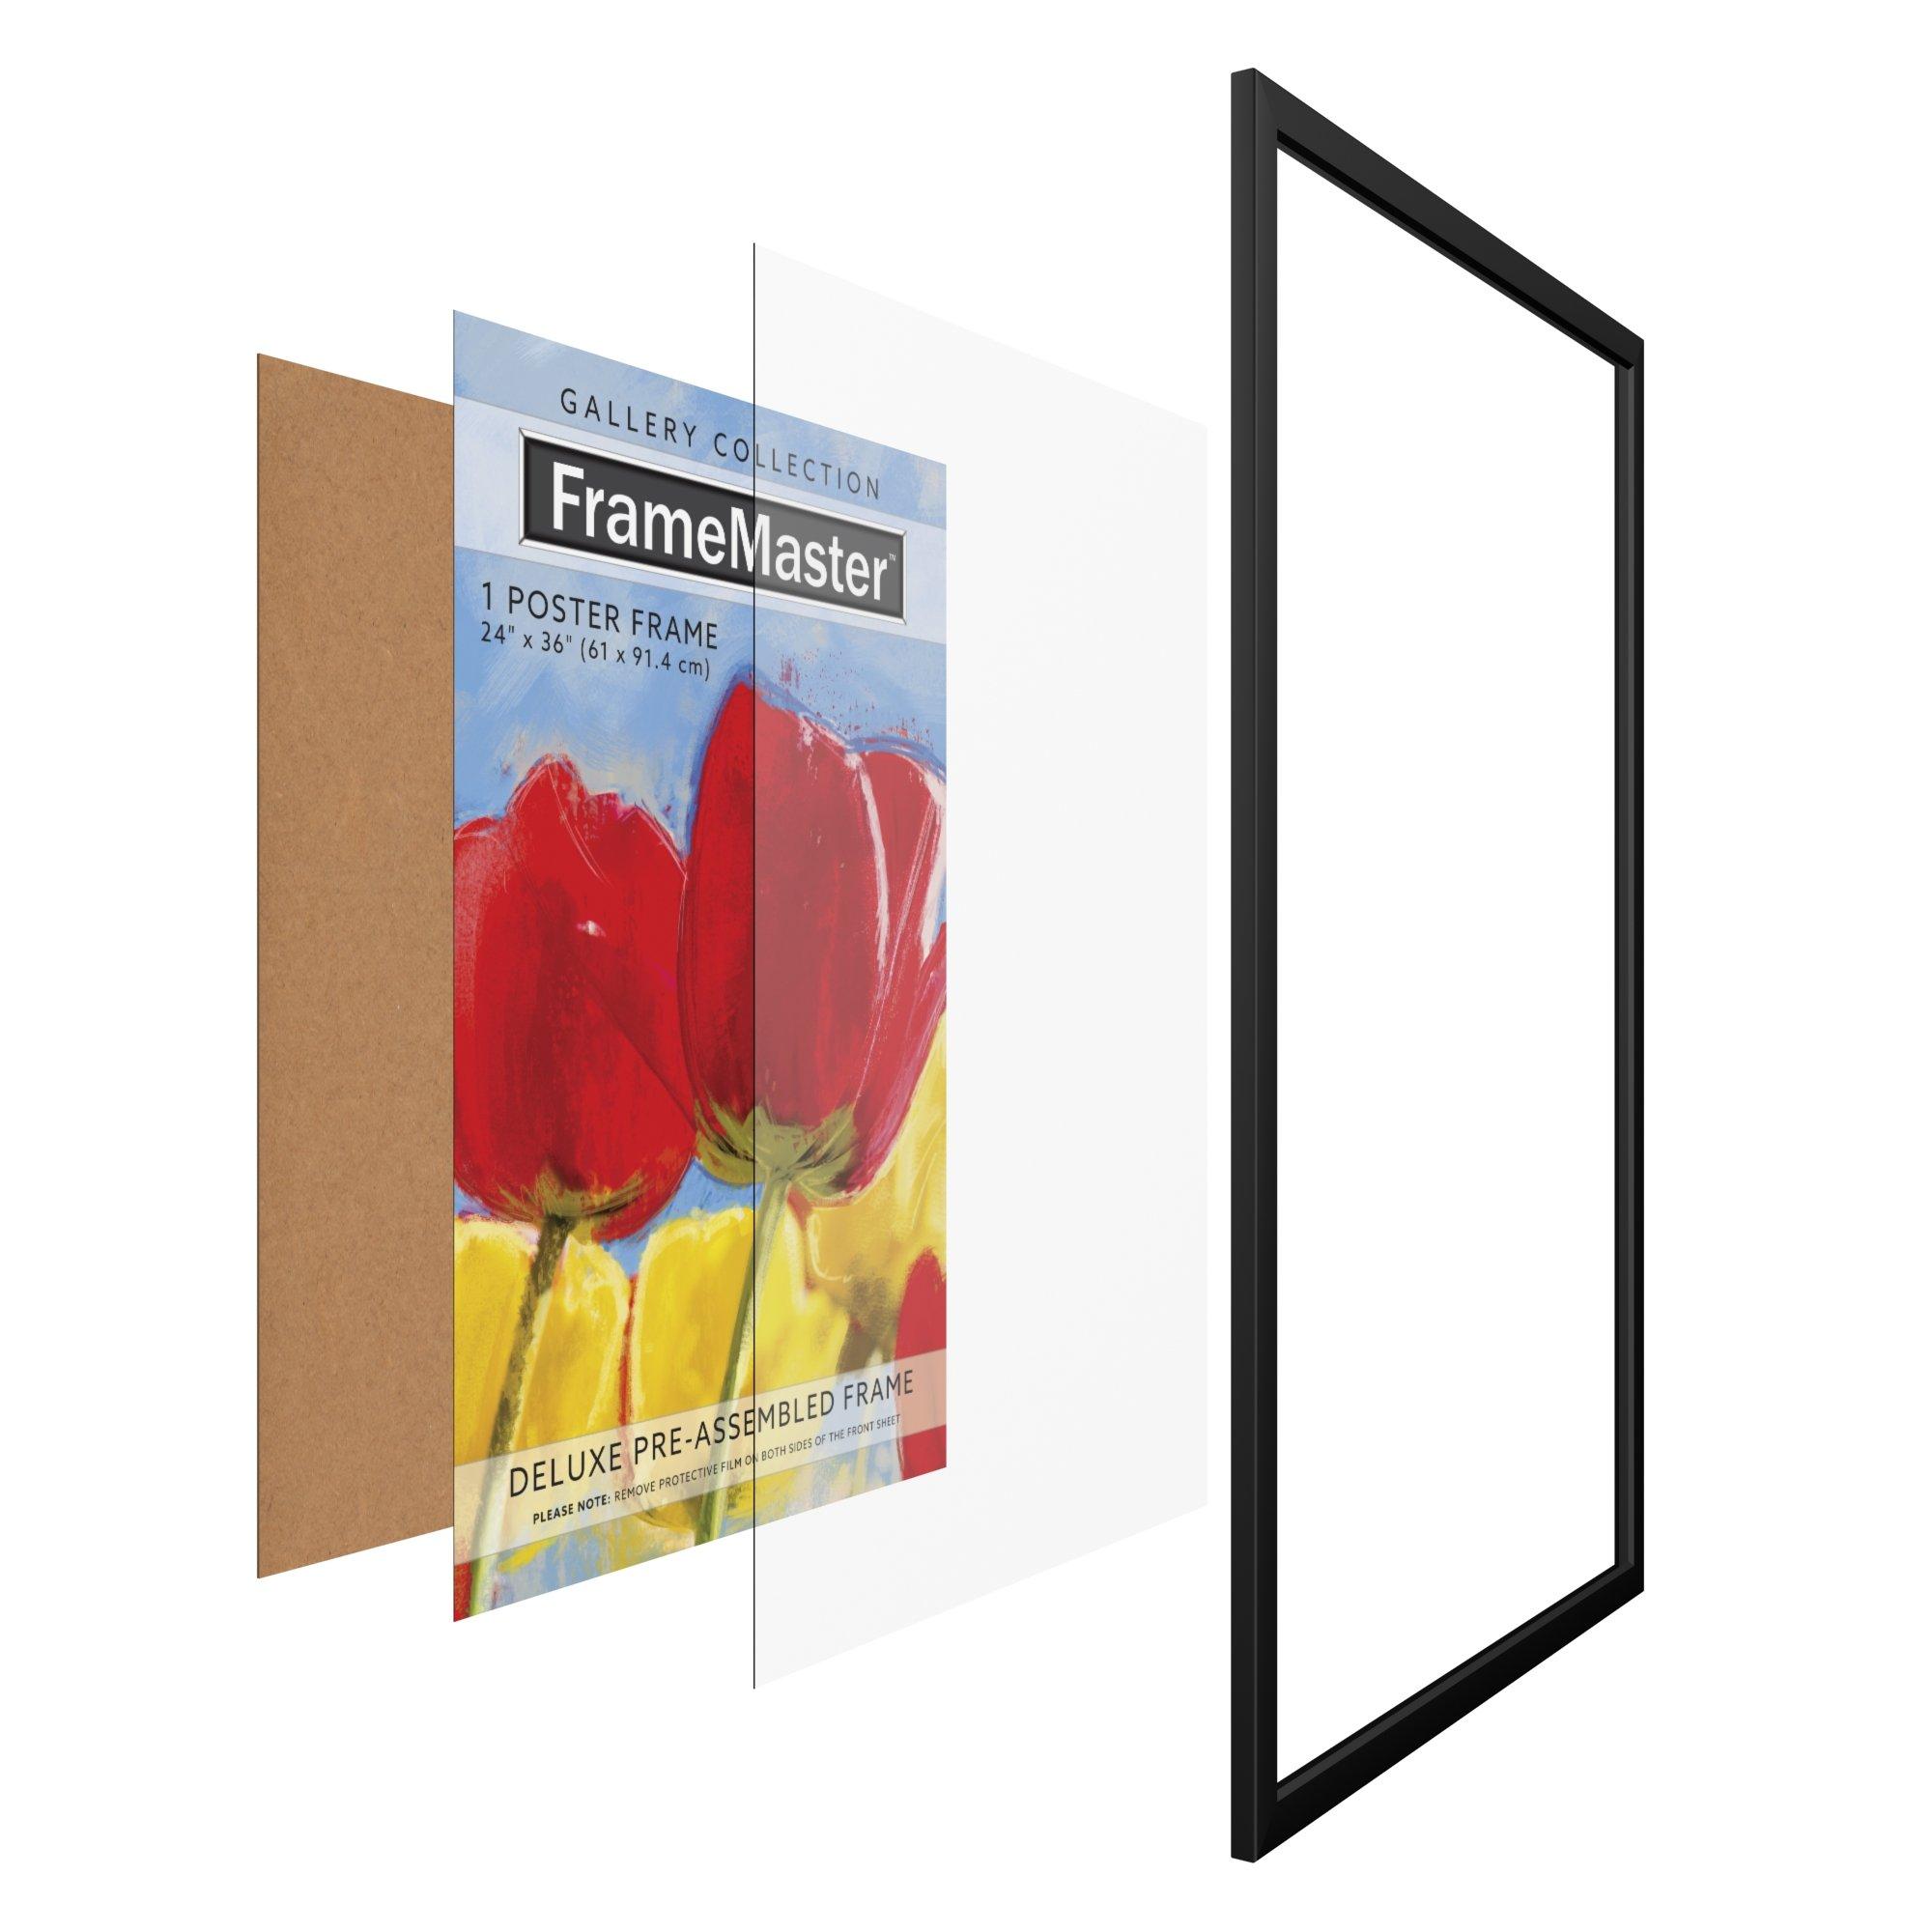 FrameMaster 24x36 Poster Frame (1 Pack), Black Wood Composite, Gallery Edition by FrameMaster (Image #5)